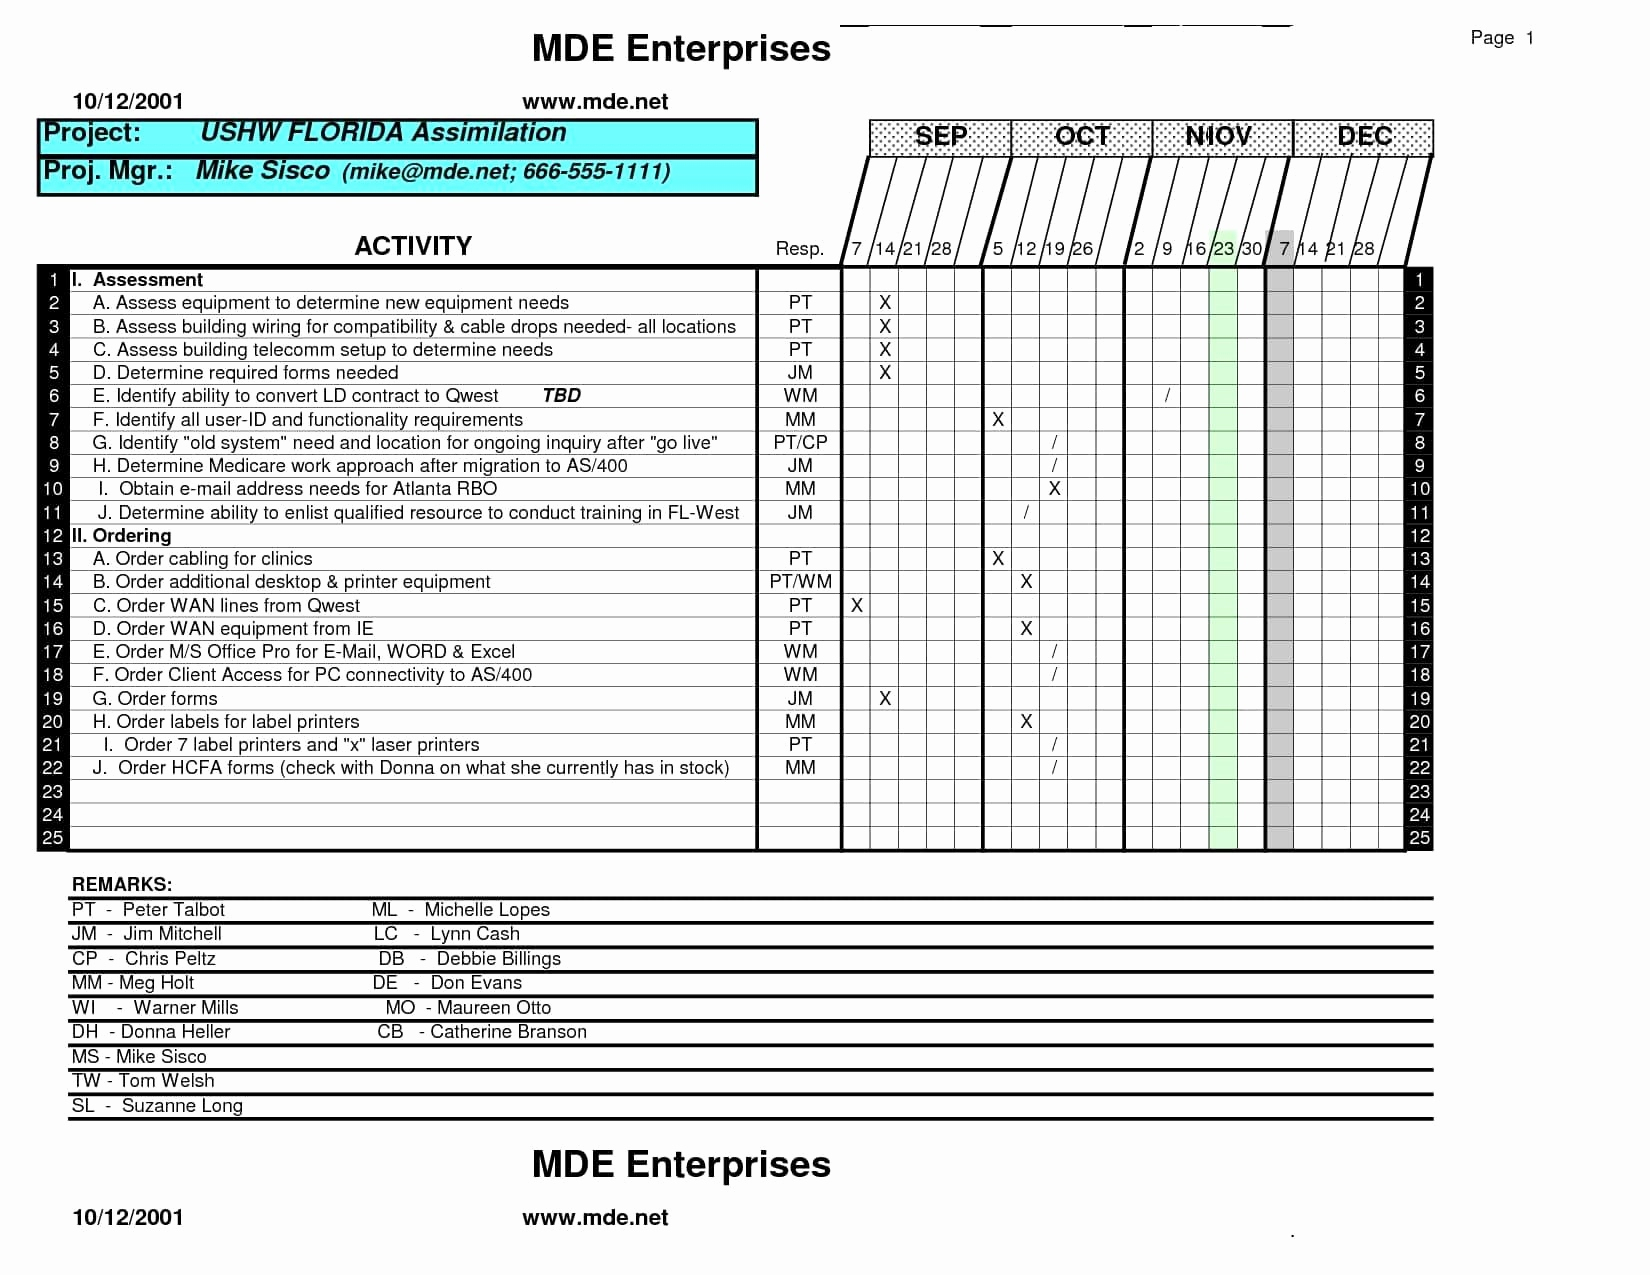 Restaurant Daily Sales Spreadsheet Free With Excel Spreadsheet For Restaurant Inventory Luxury Free Restaurant